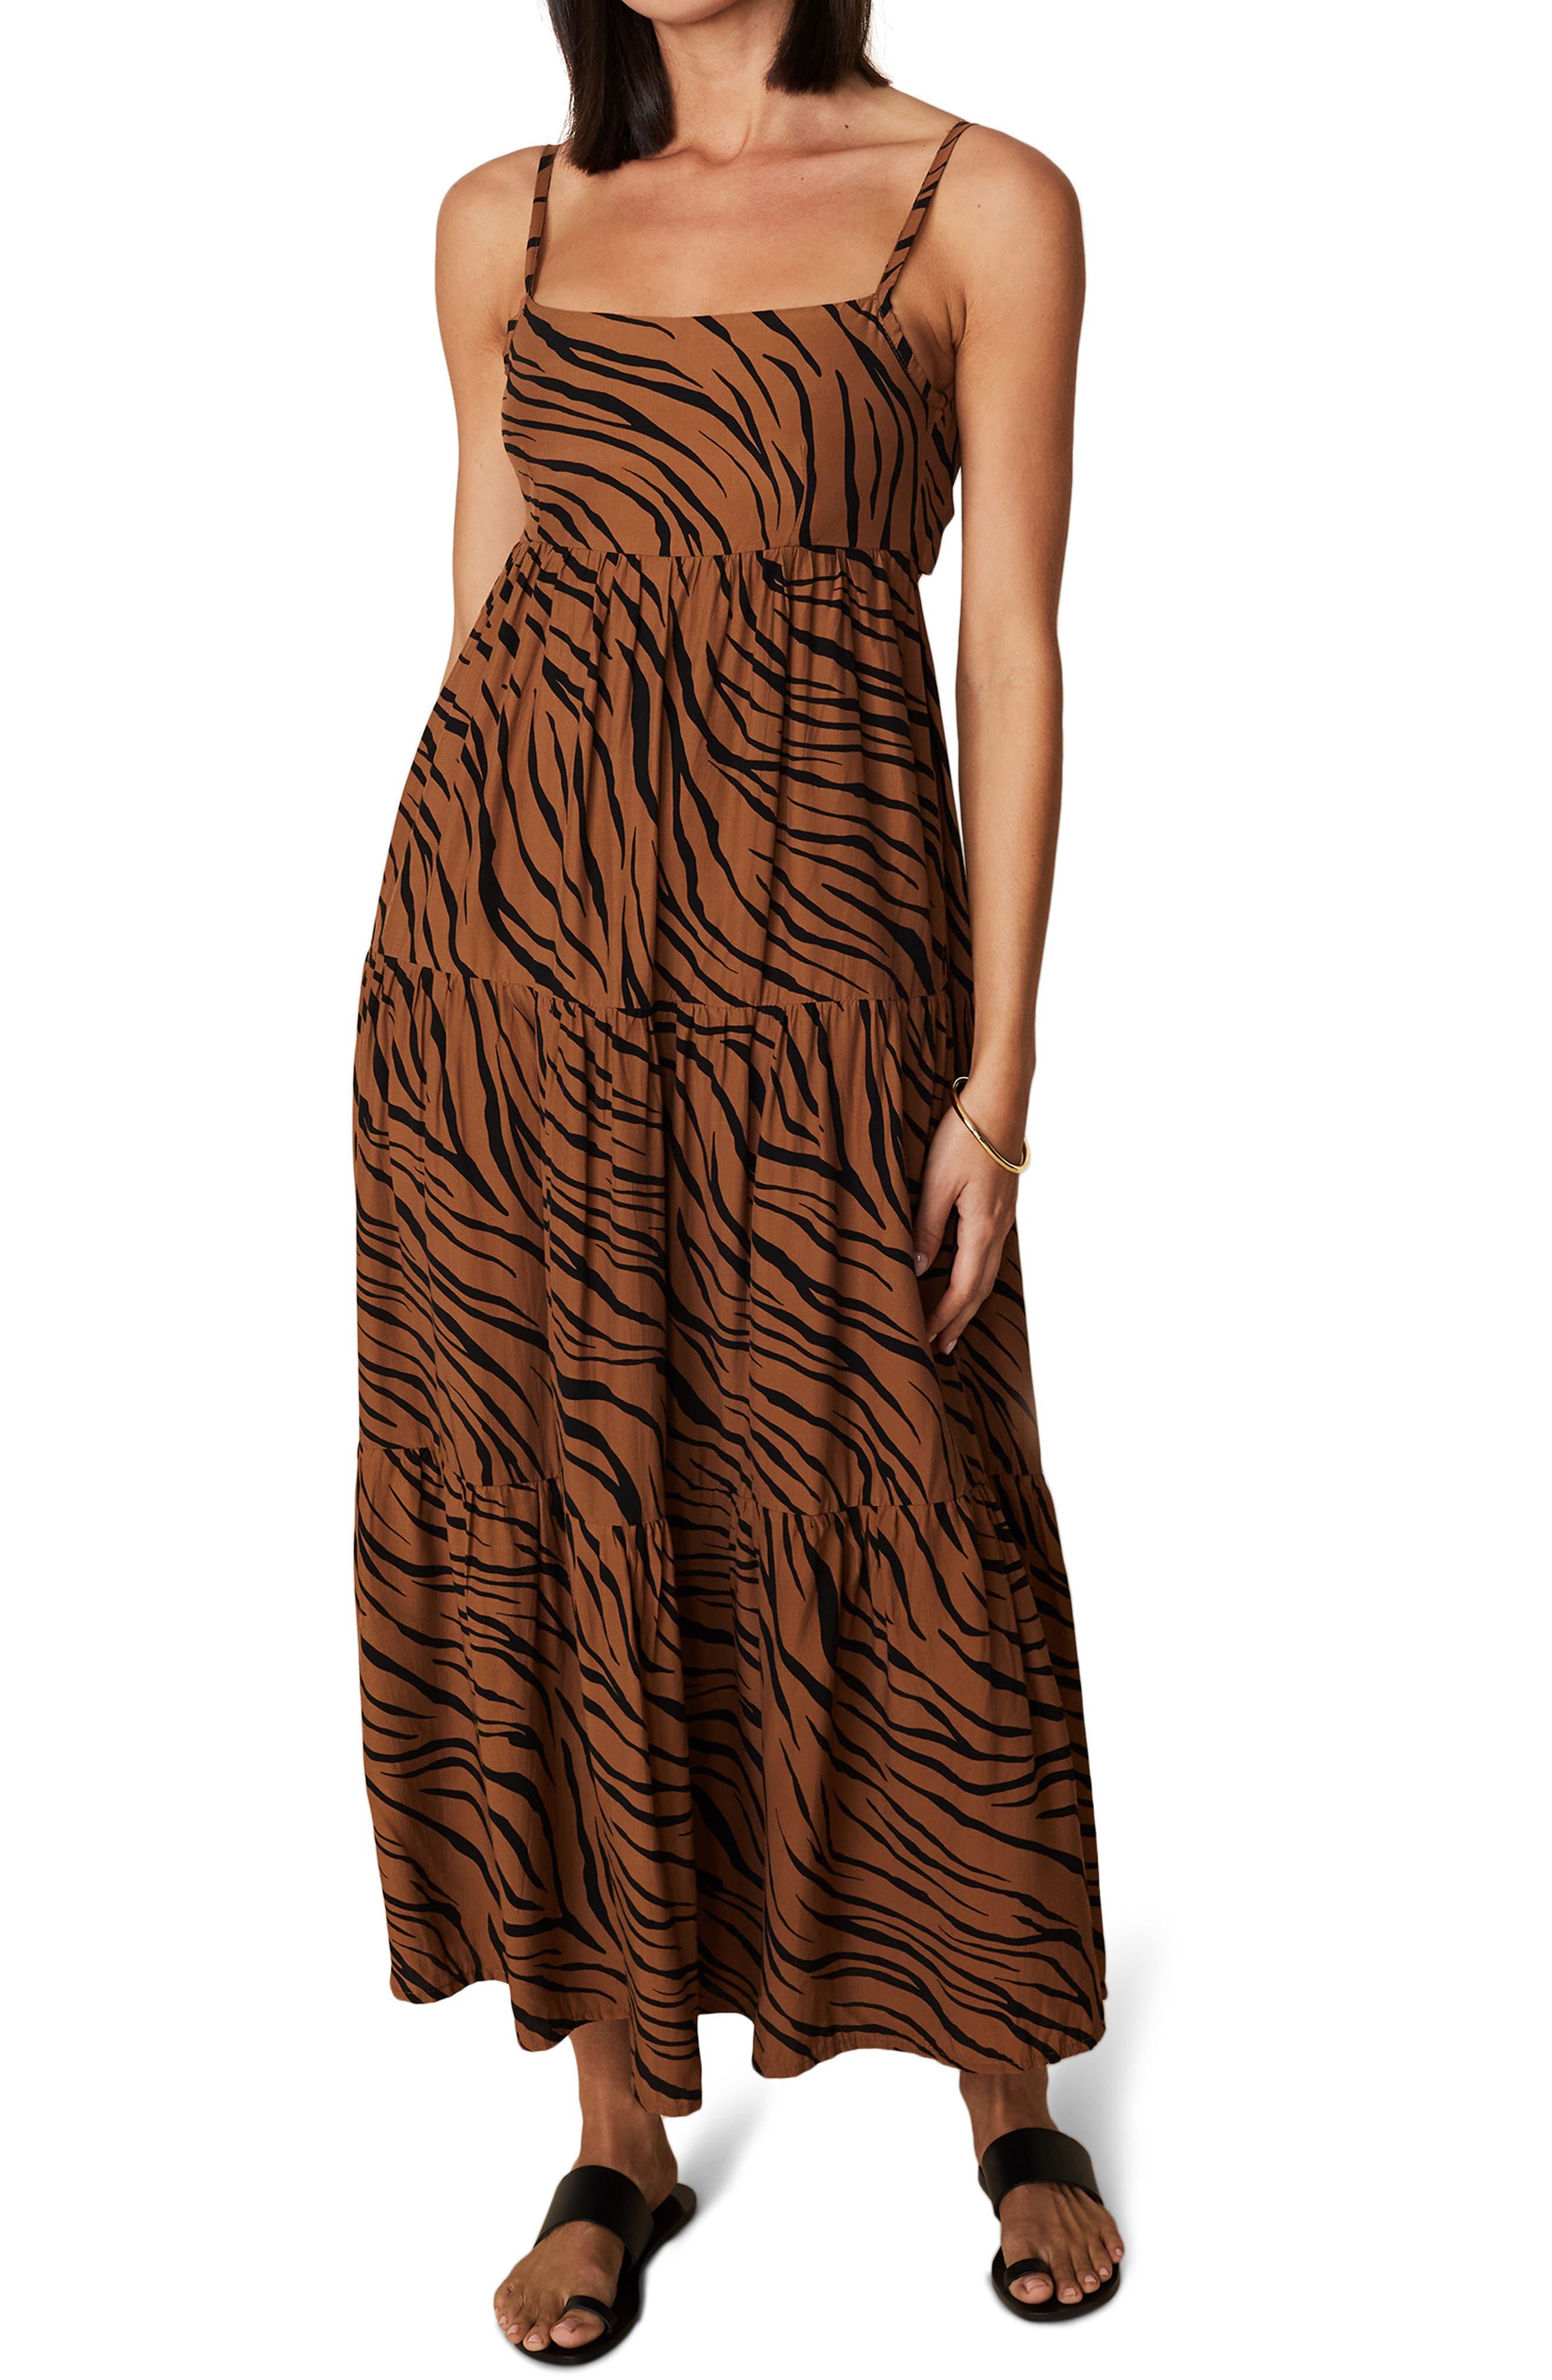 Corvina Animal Print Dress